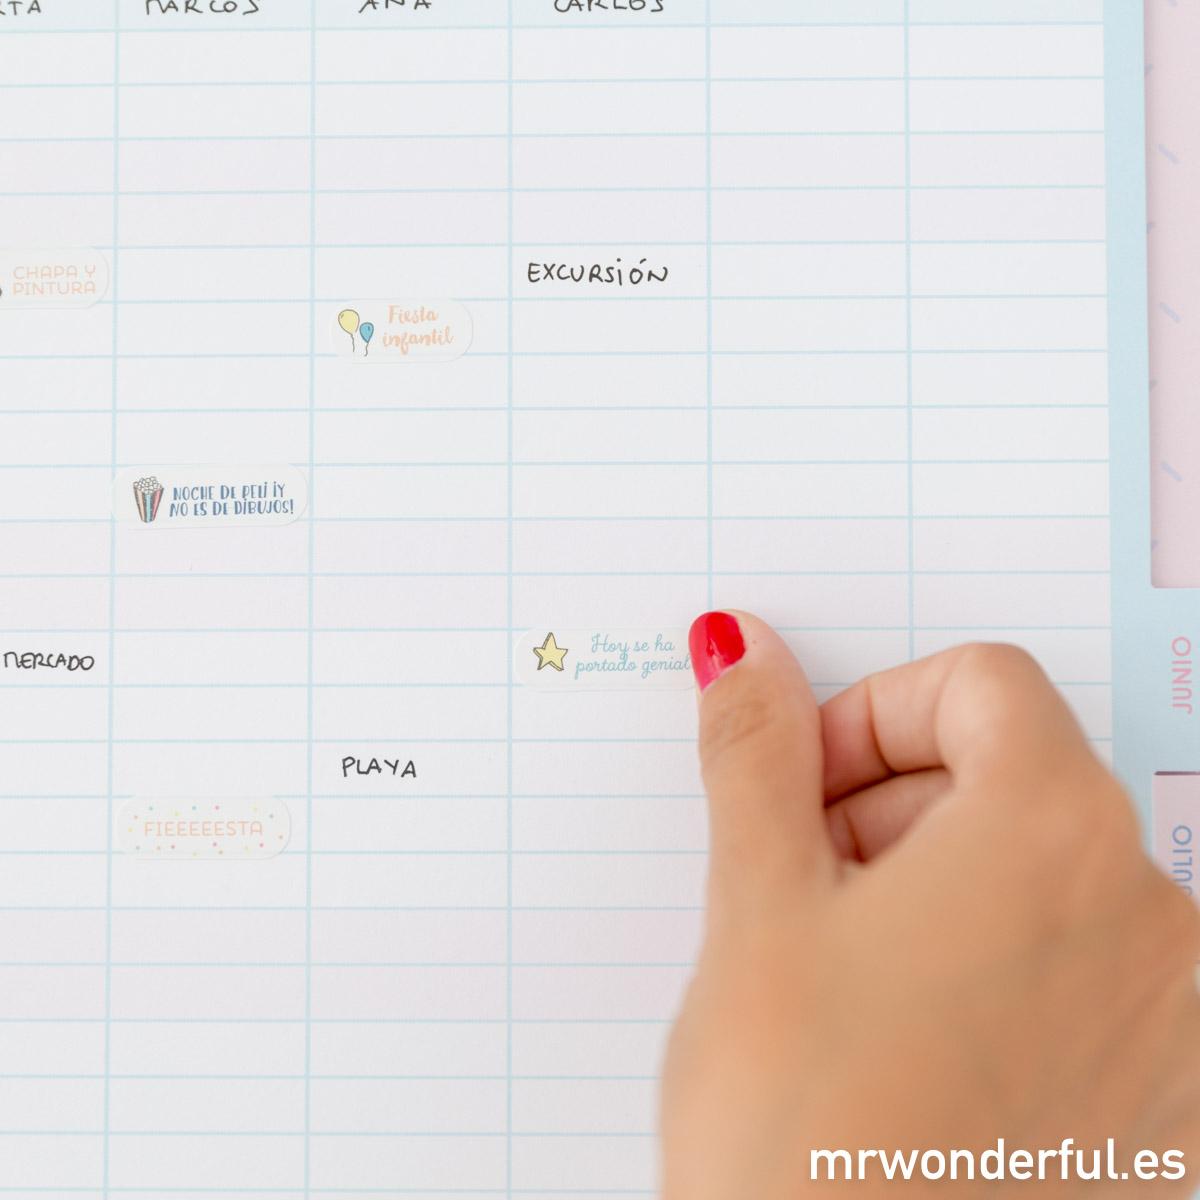 mrwonderful_8435460708364_WOA03742ES_Calendario-familiar-2017-Un-calendario-genial-para_ES-28